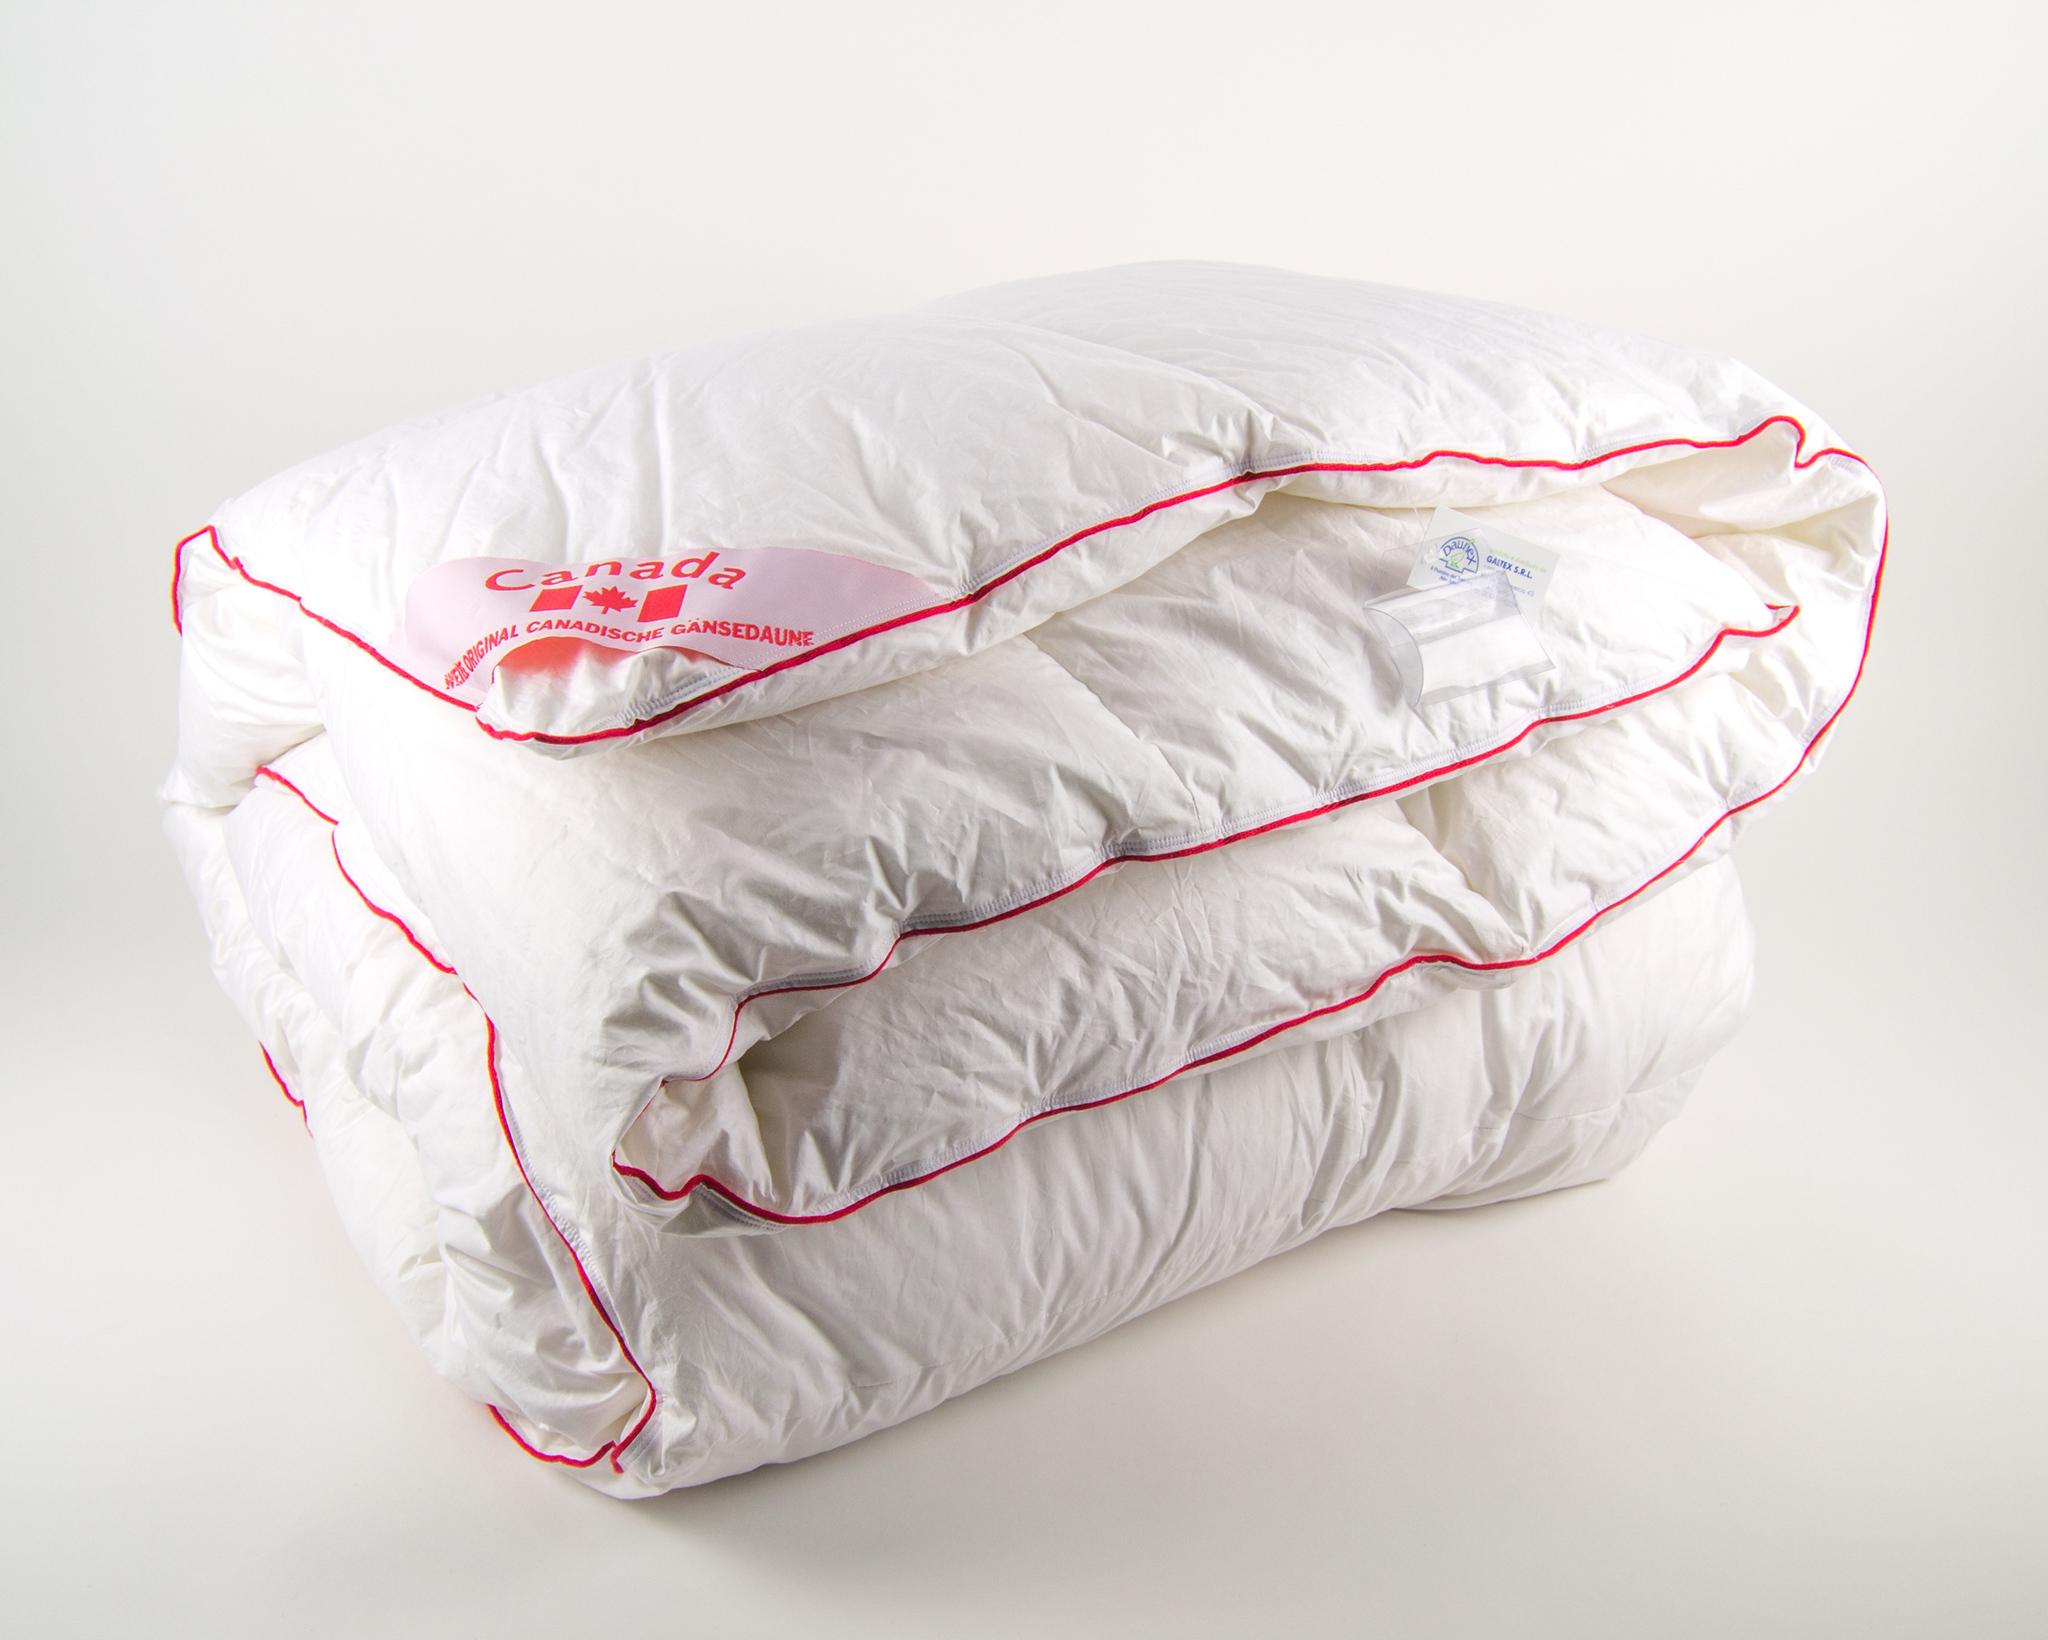 Одеяла Элитное одеяло пуховое 155х200 Canadese от Daunex elitnoe-odeyalo-puhovoe-155h200-canadese-ot-daunex-foto.jpg